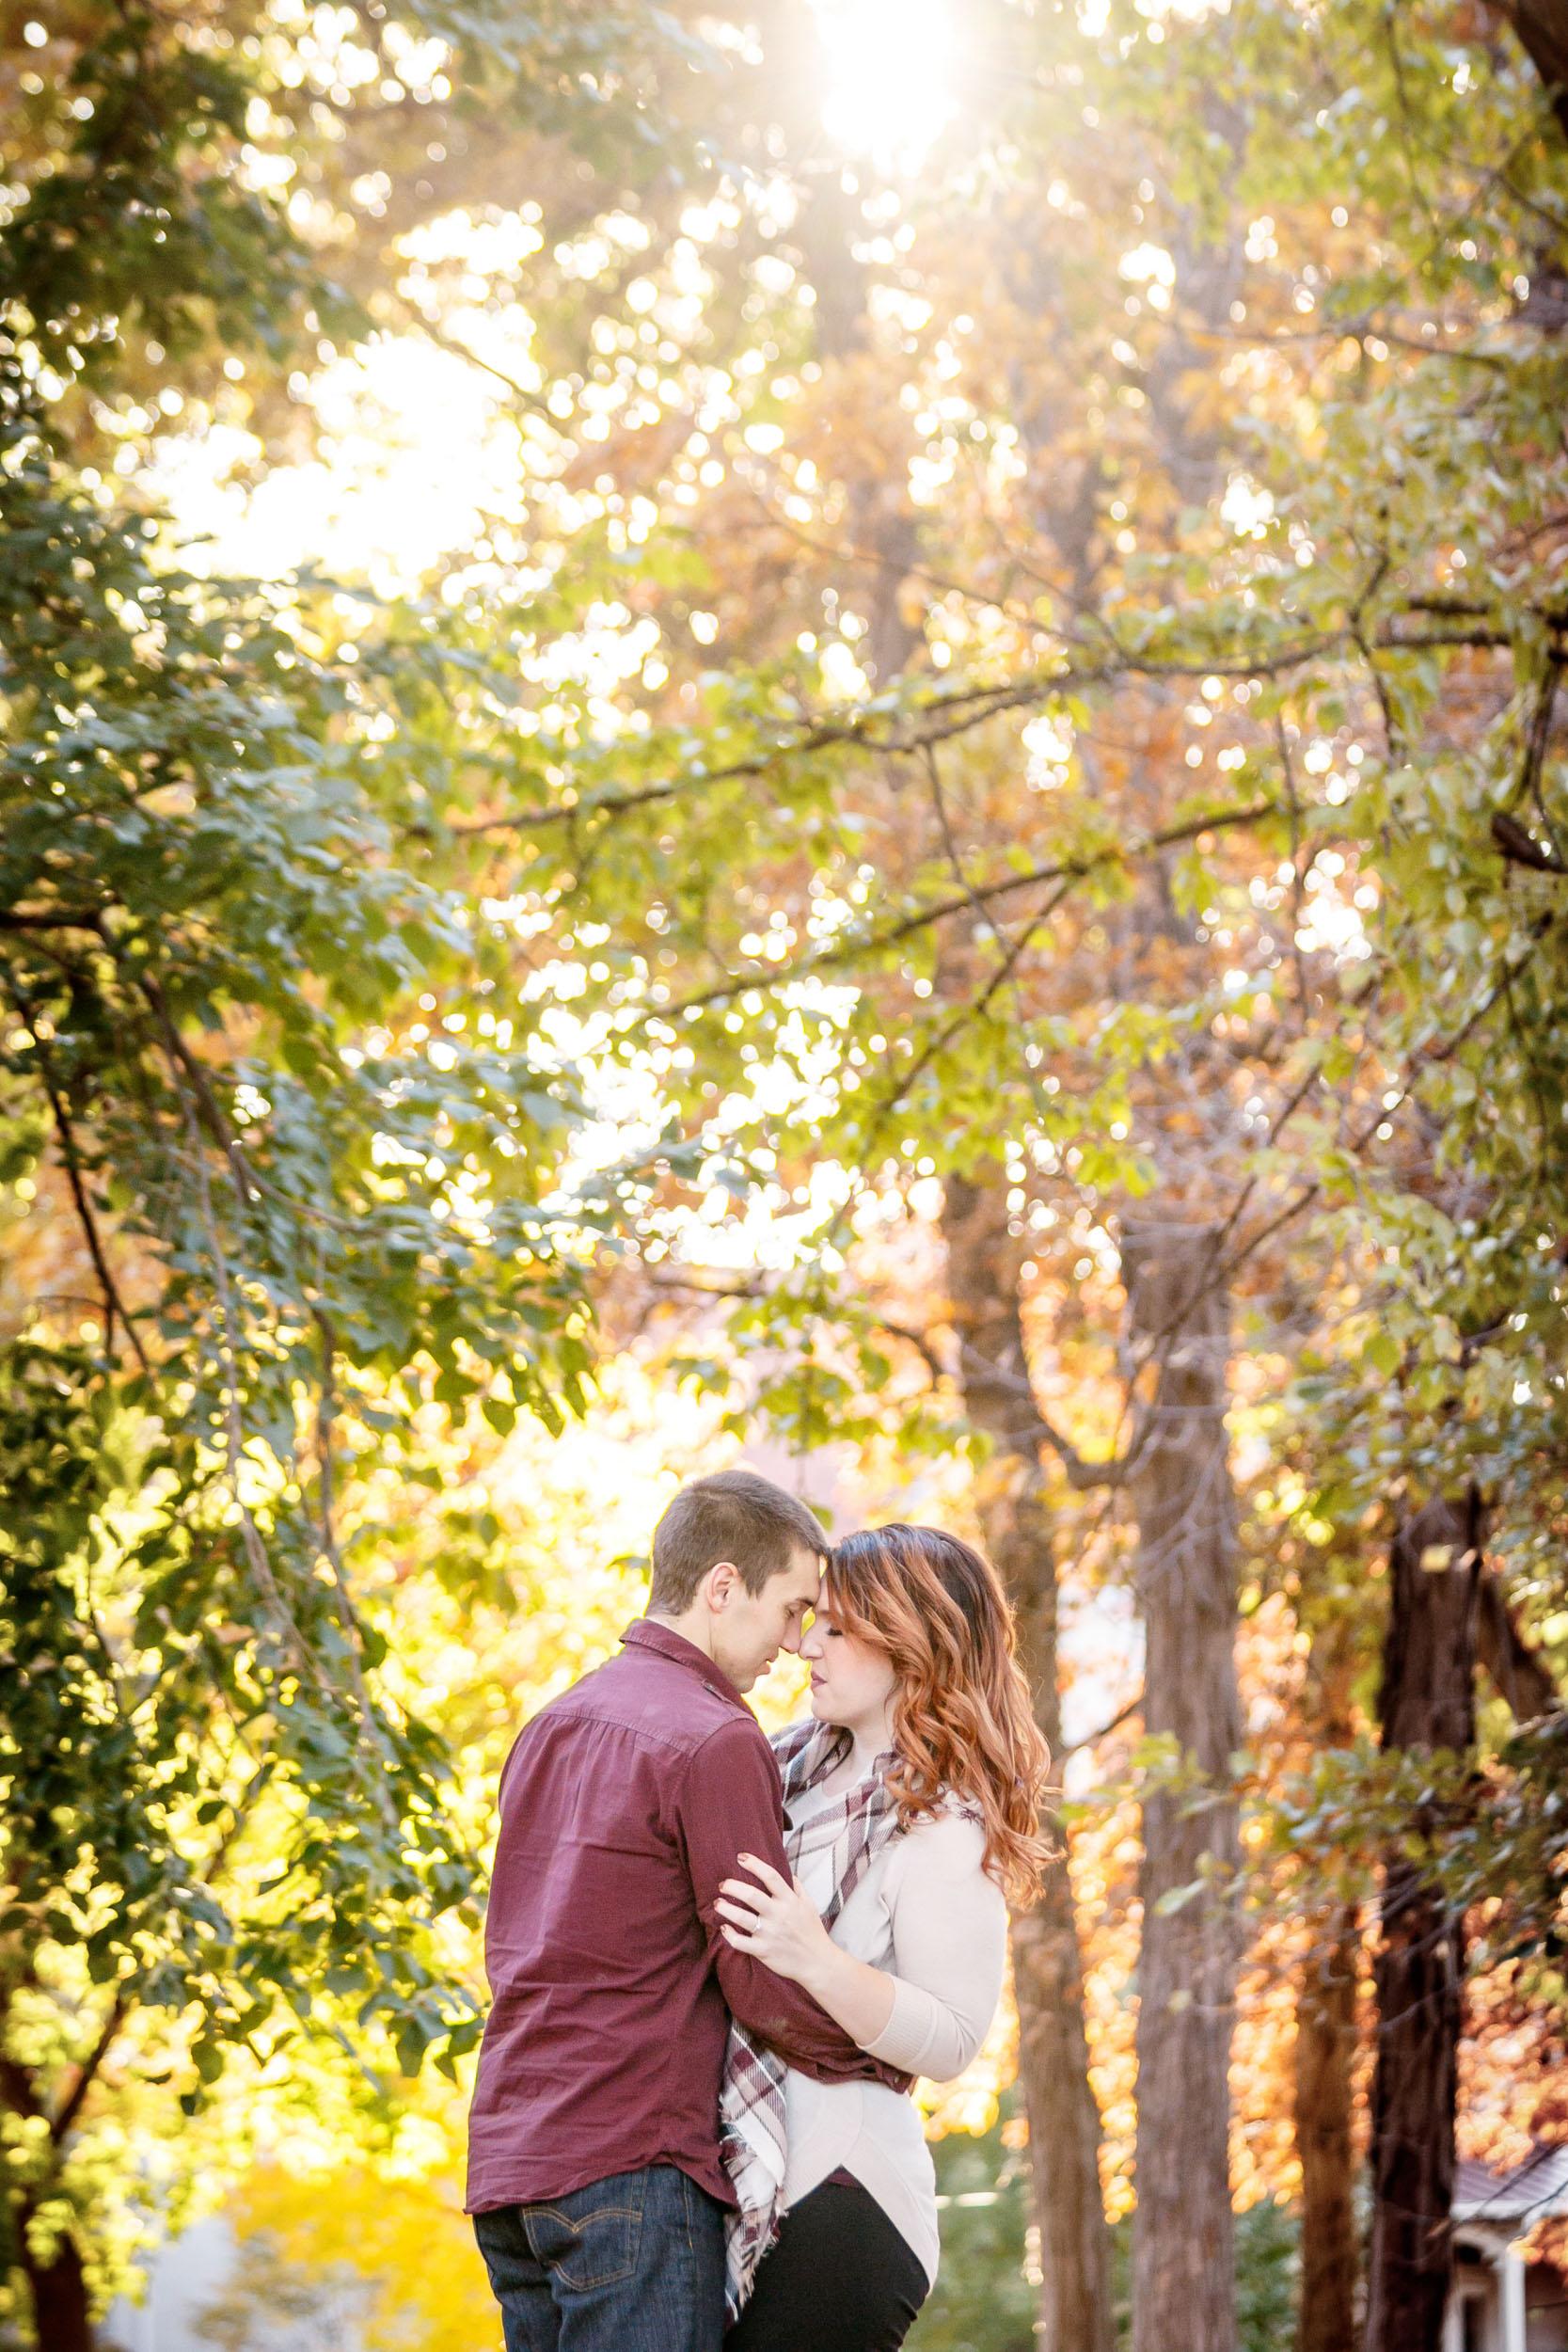 fall-engagement-photos-riverside-park-neenah-wisconsin--adam-shea-photography-green-bay-appleton-neenah-photographer-24.jpg